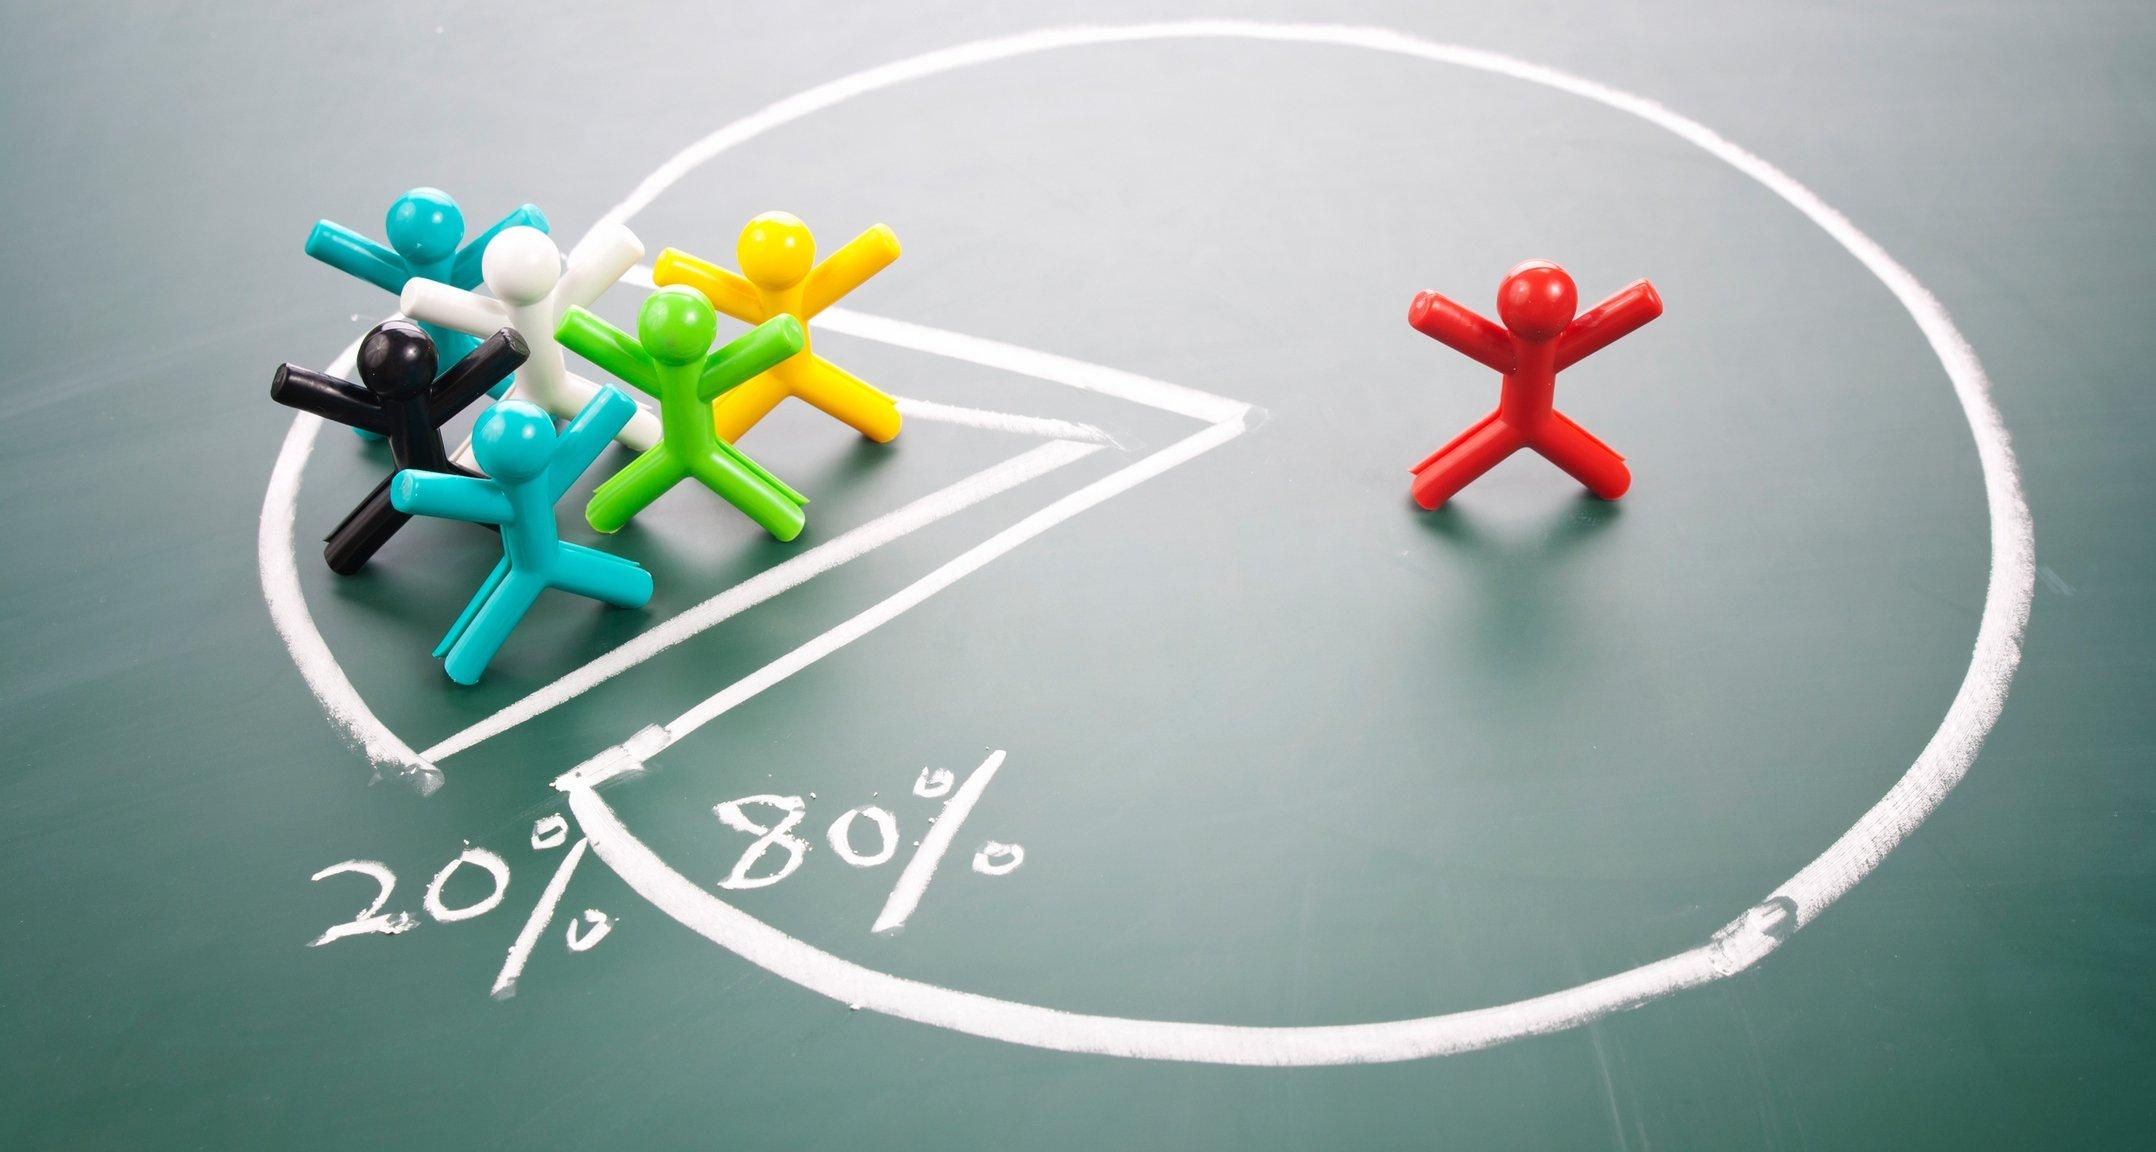 Governance, Risk and Compliance GRC software - Deloitte